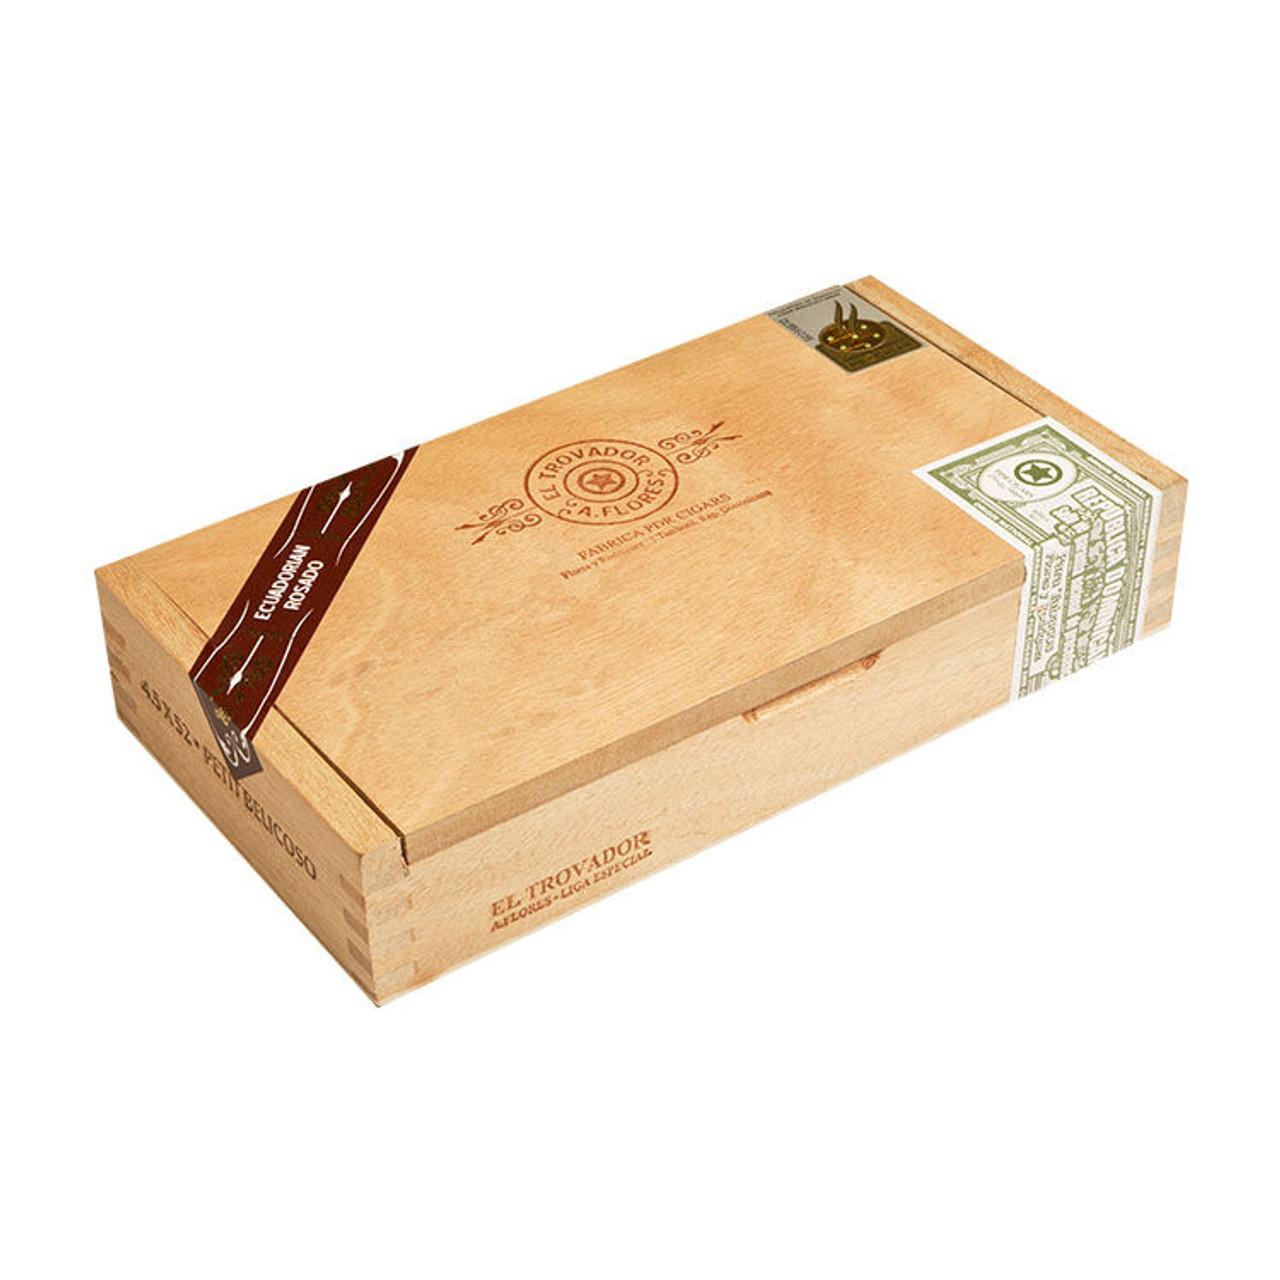 PDR El Trovador Petit Belicoso Cigars - 4.5 x 50 (Box of 24)